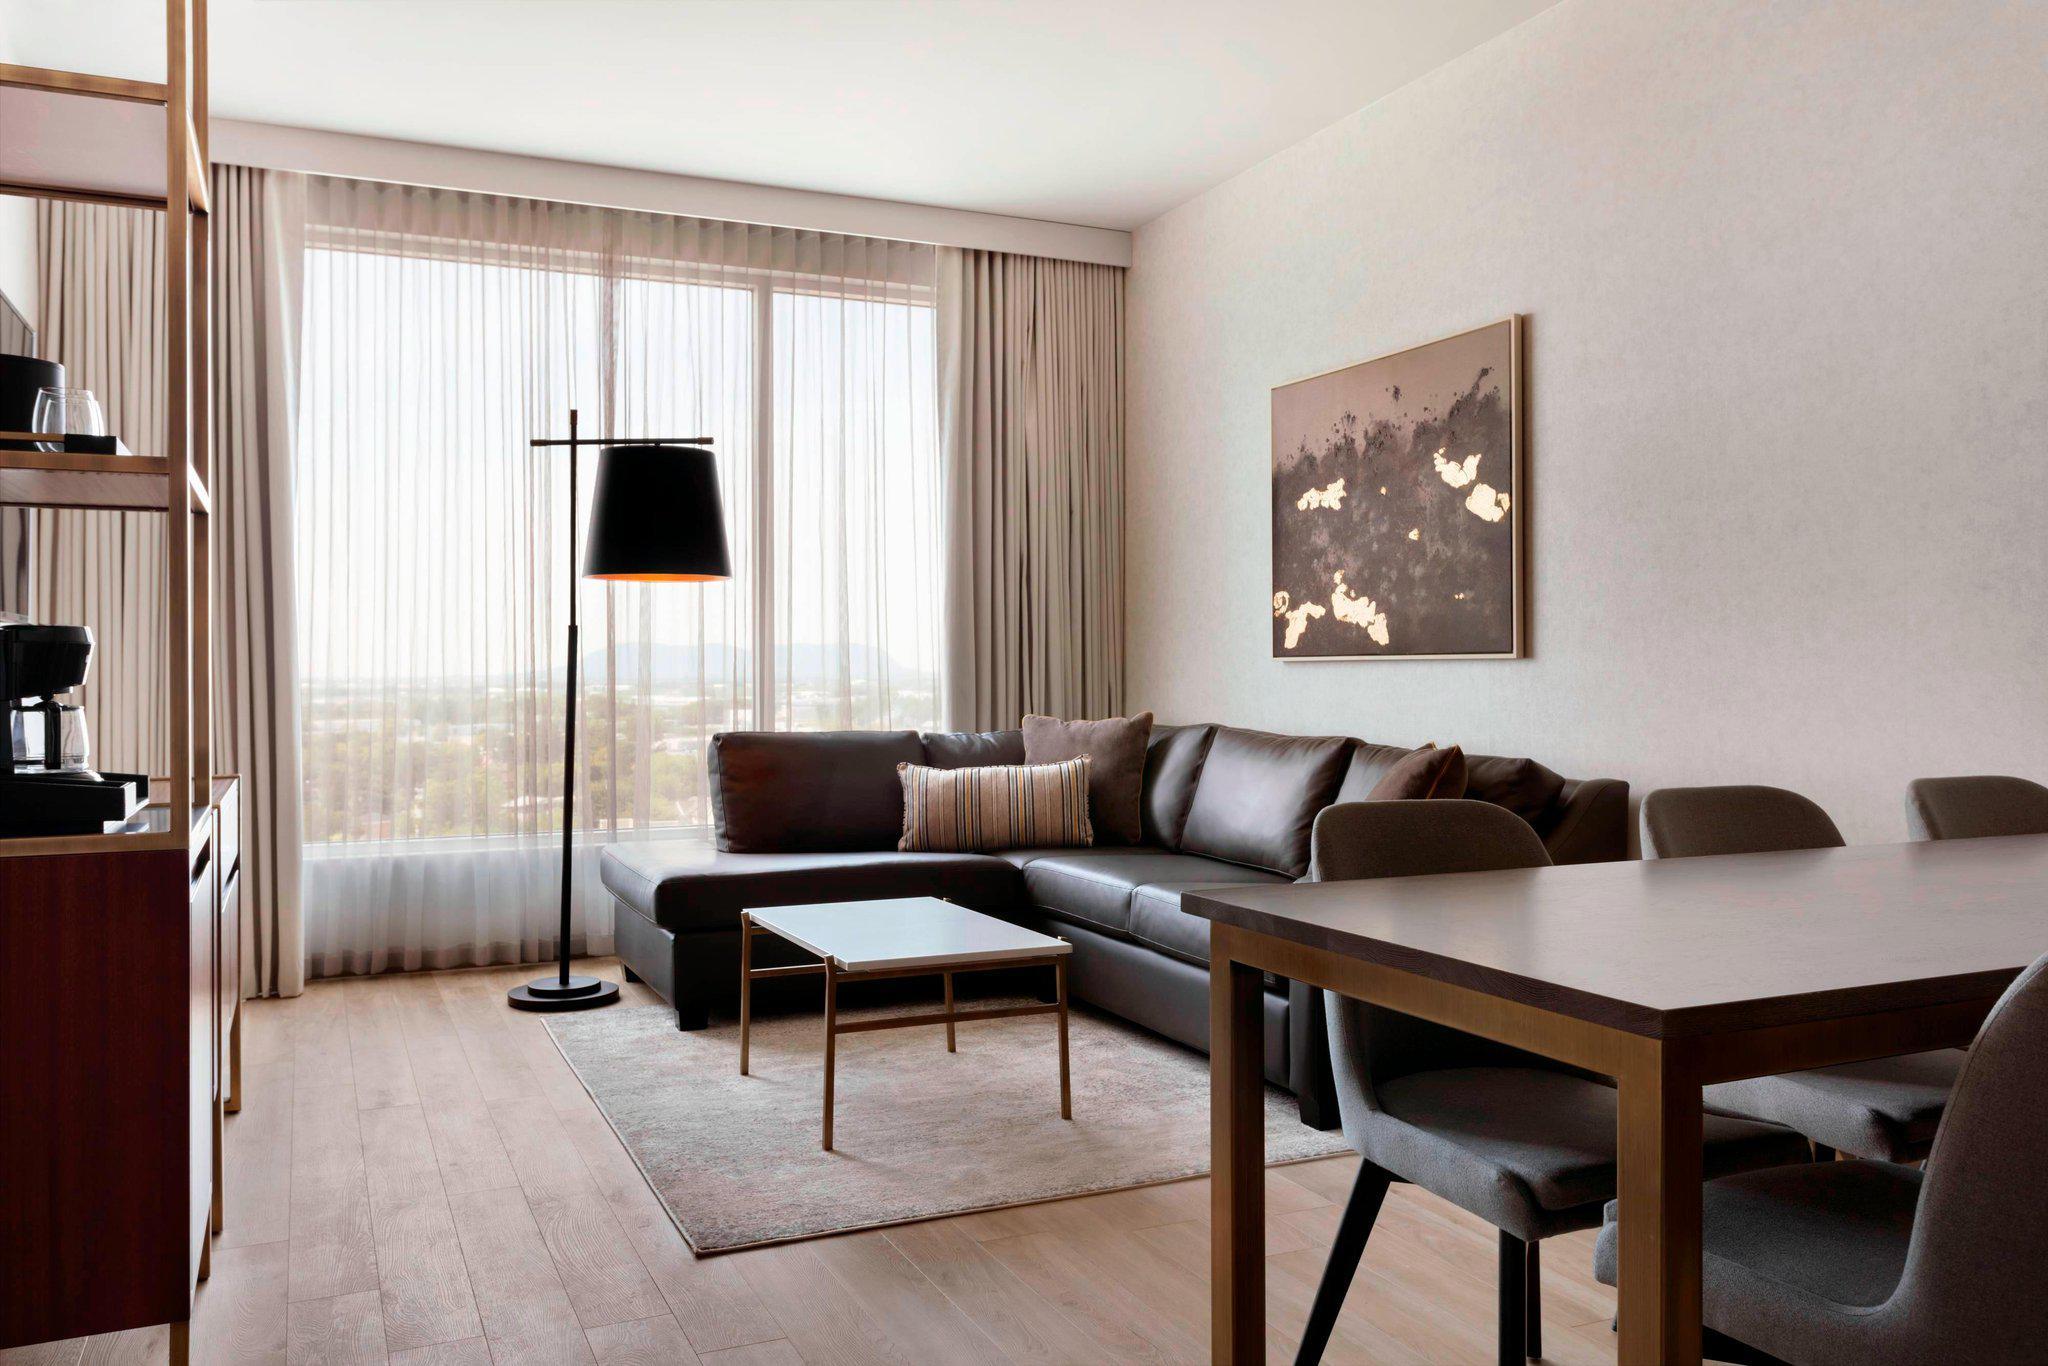 Sheraton Saint-Hyacinthe Hotel